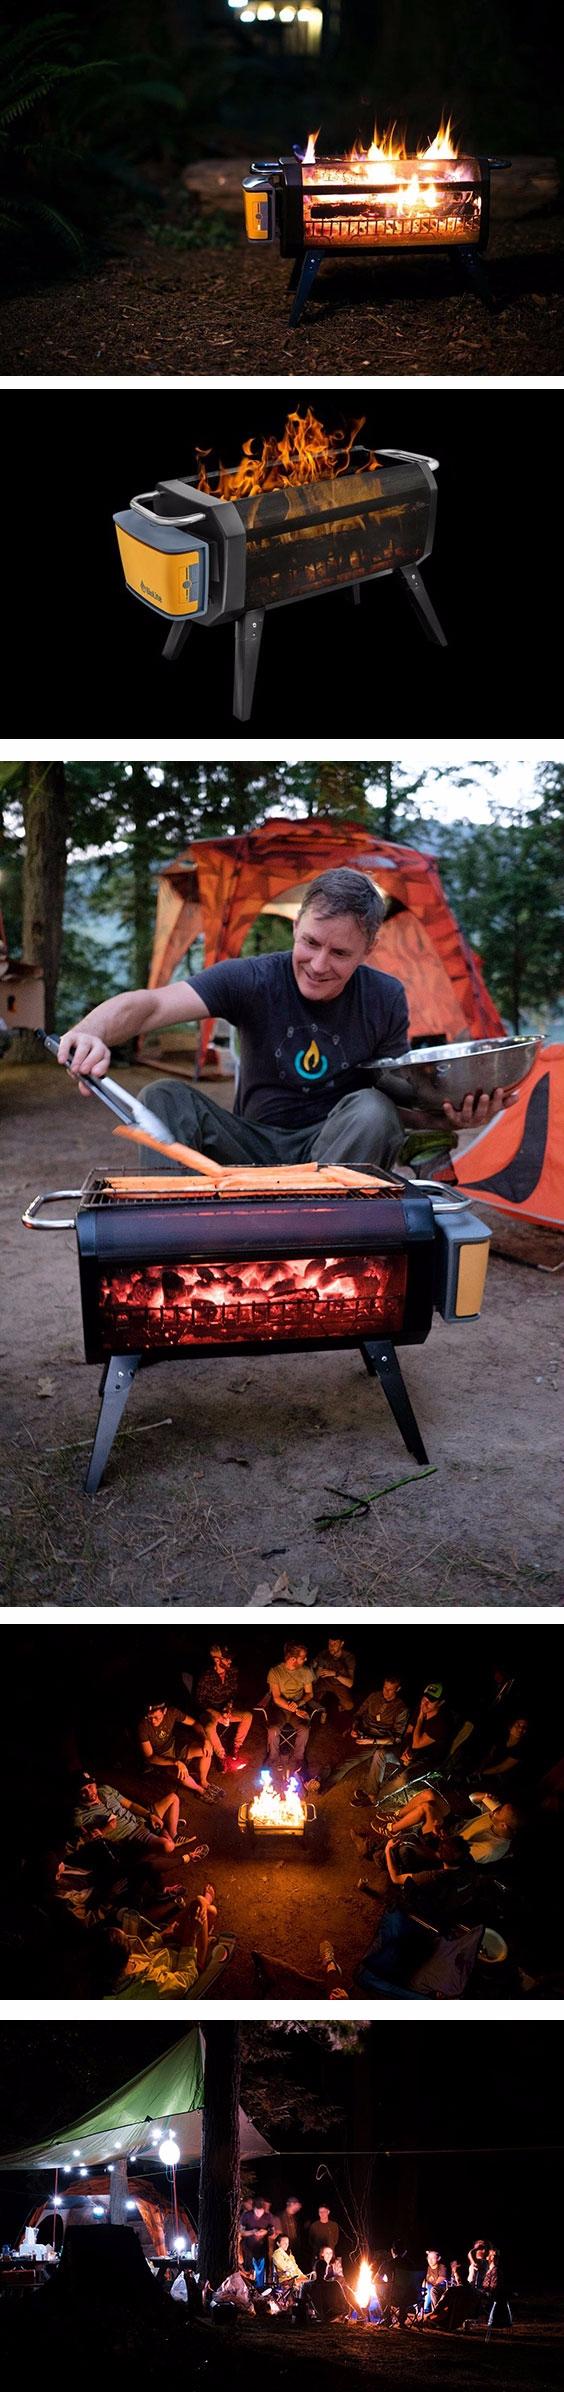 BioLite FirePit: smokeless port - adaptnetwork | ello